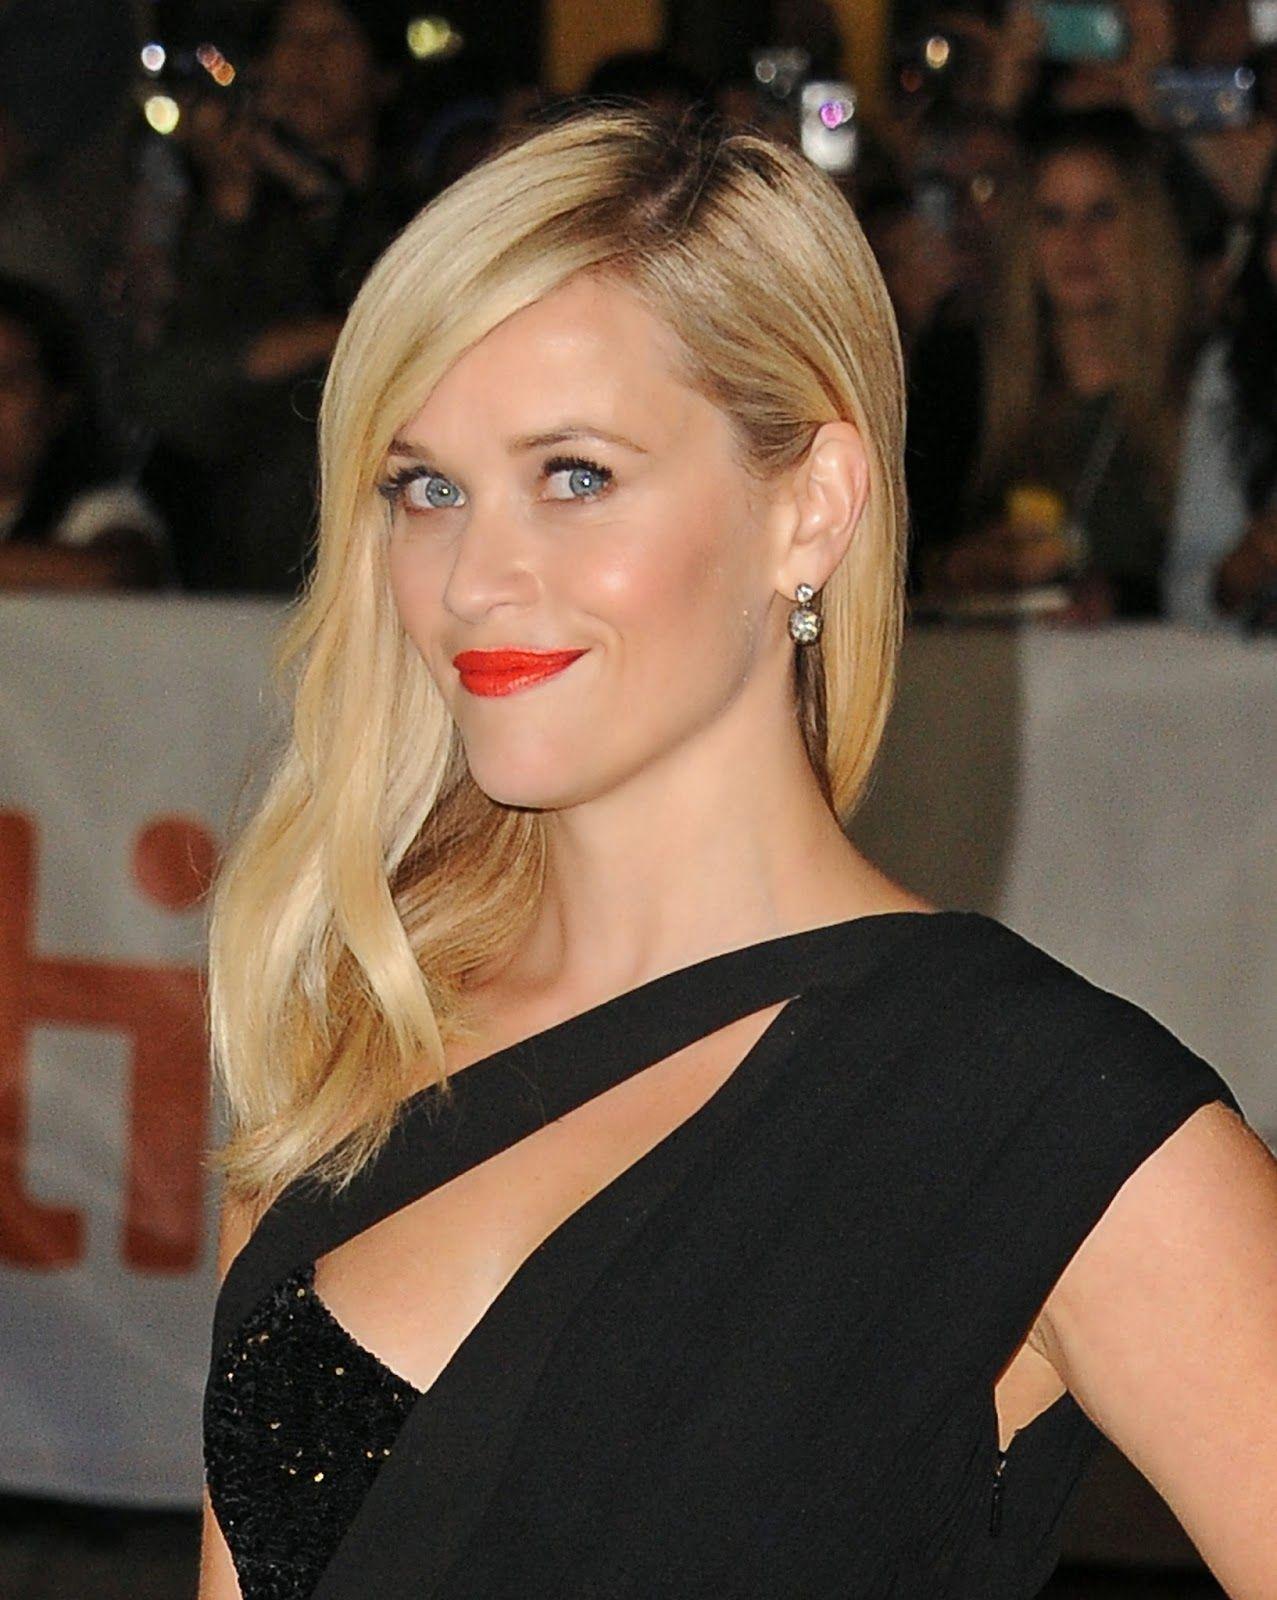 premiere, Festival de Cine de Toronto 2014, premiere, Wild, Reese Whiterspoon, peinado, Moroccanoil